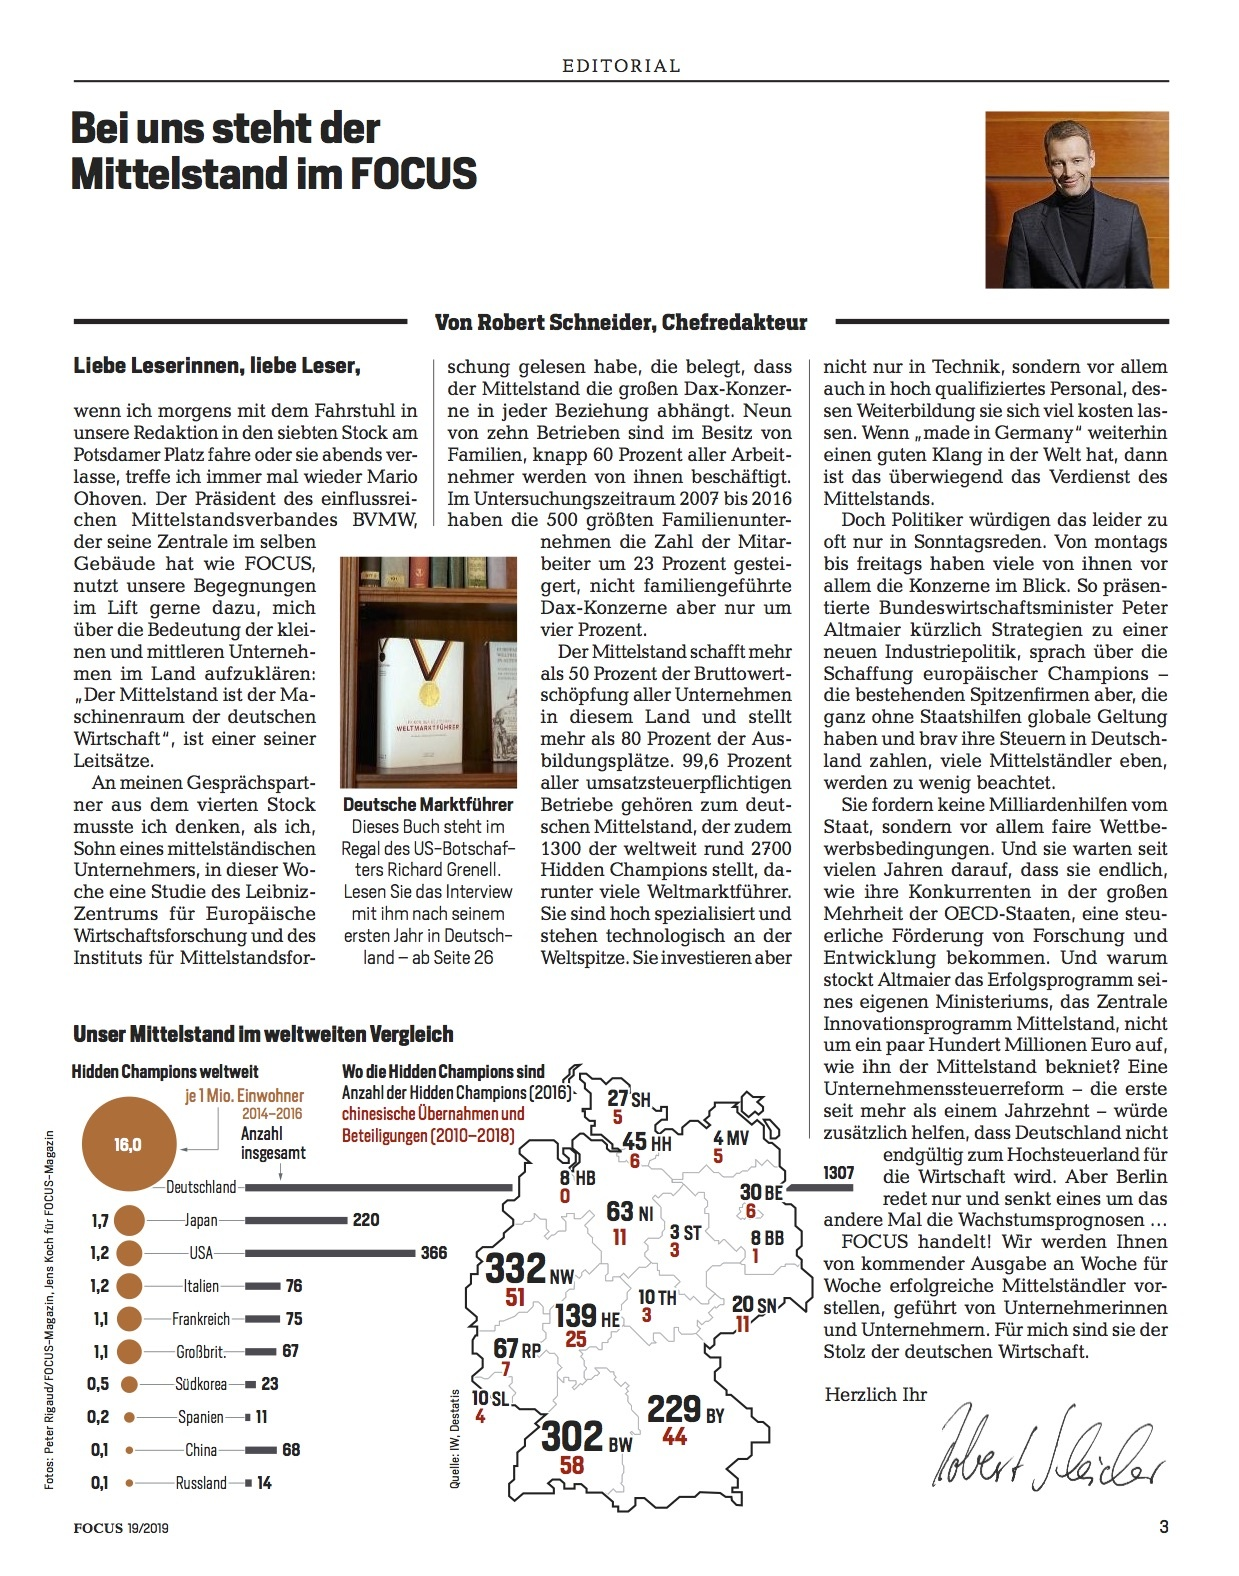 FOCUS FOCUS Magazin - Die neue Lust am Essen